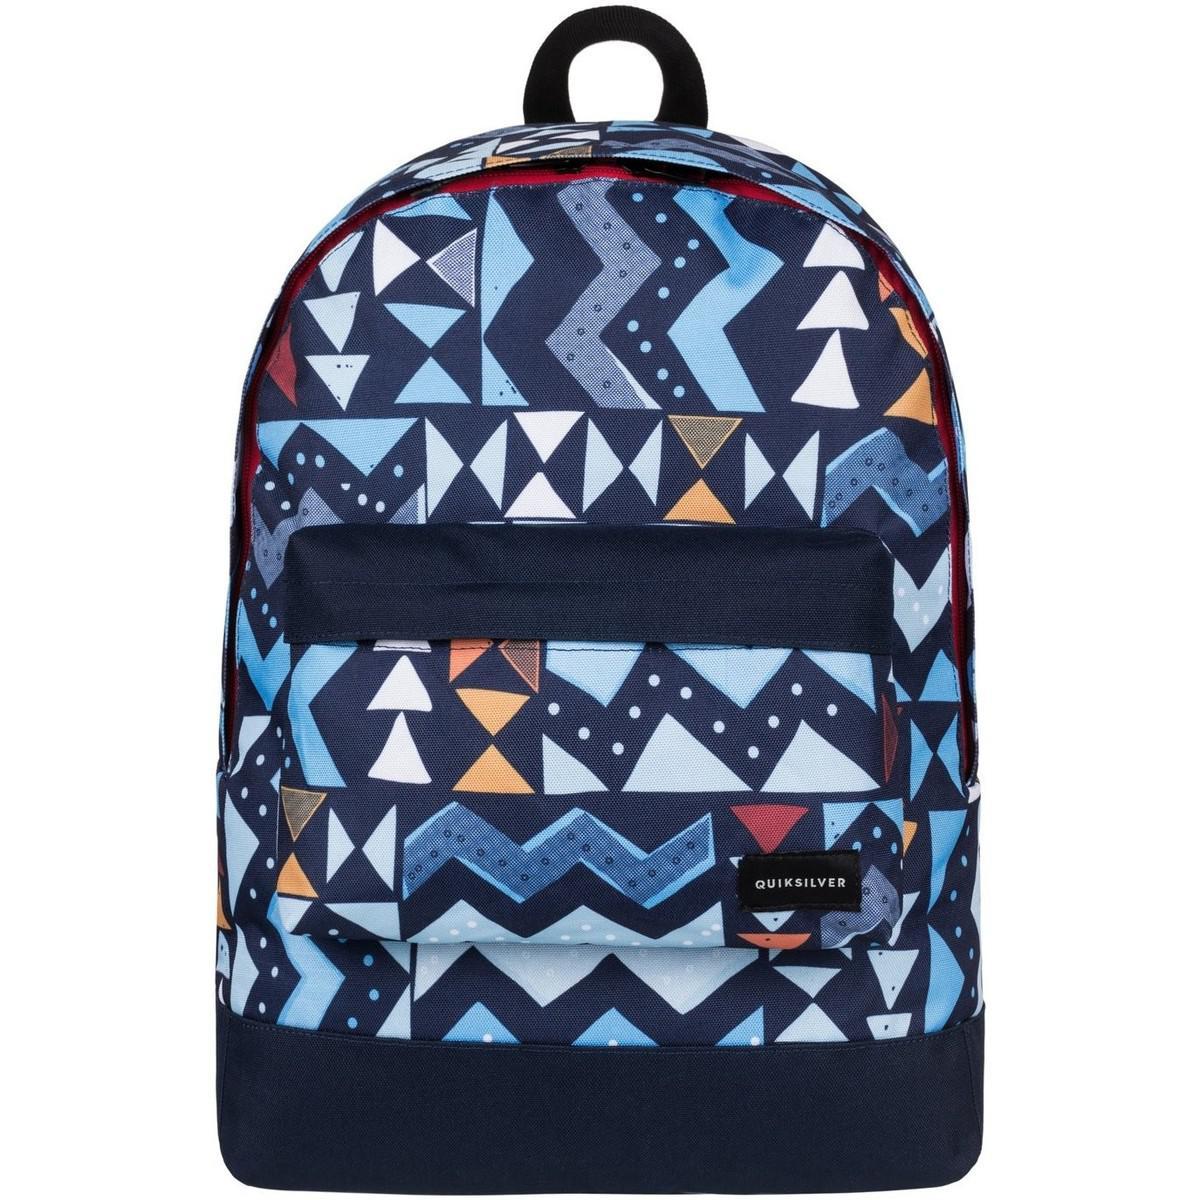 edbdc3975e Quiksilver Everyday Poster - Mochila Mediana Men's Backpack In Blue ...